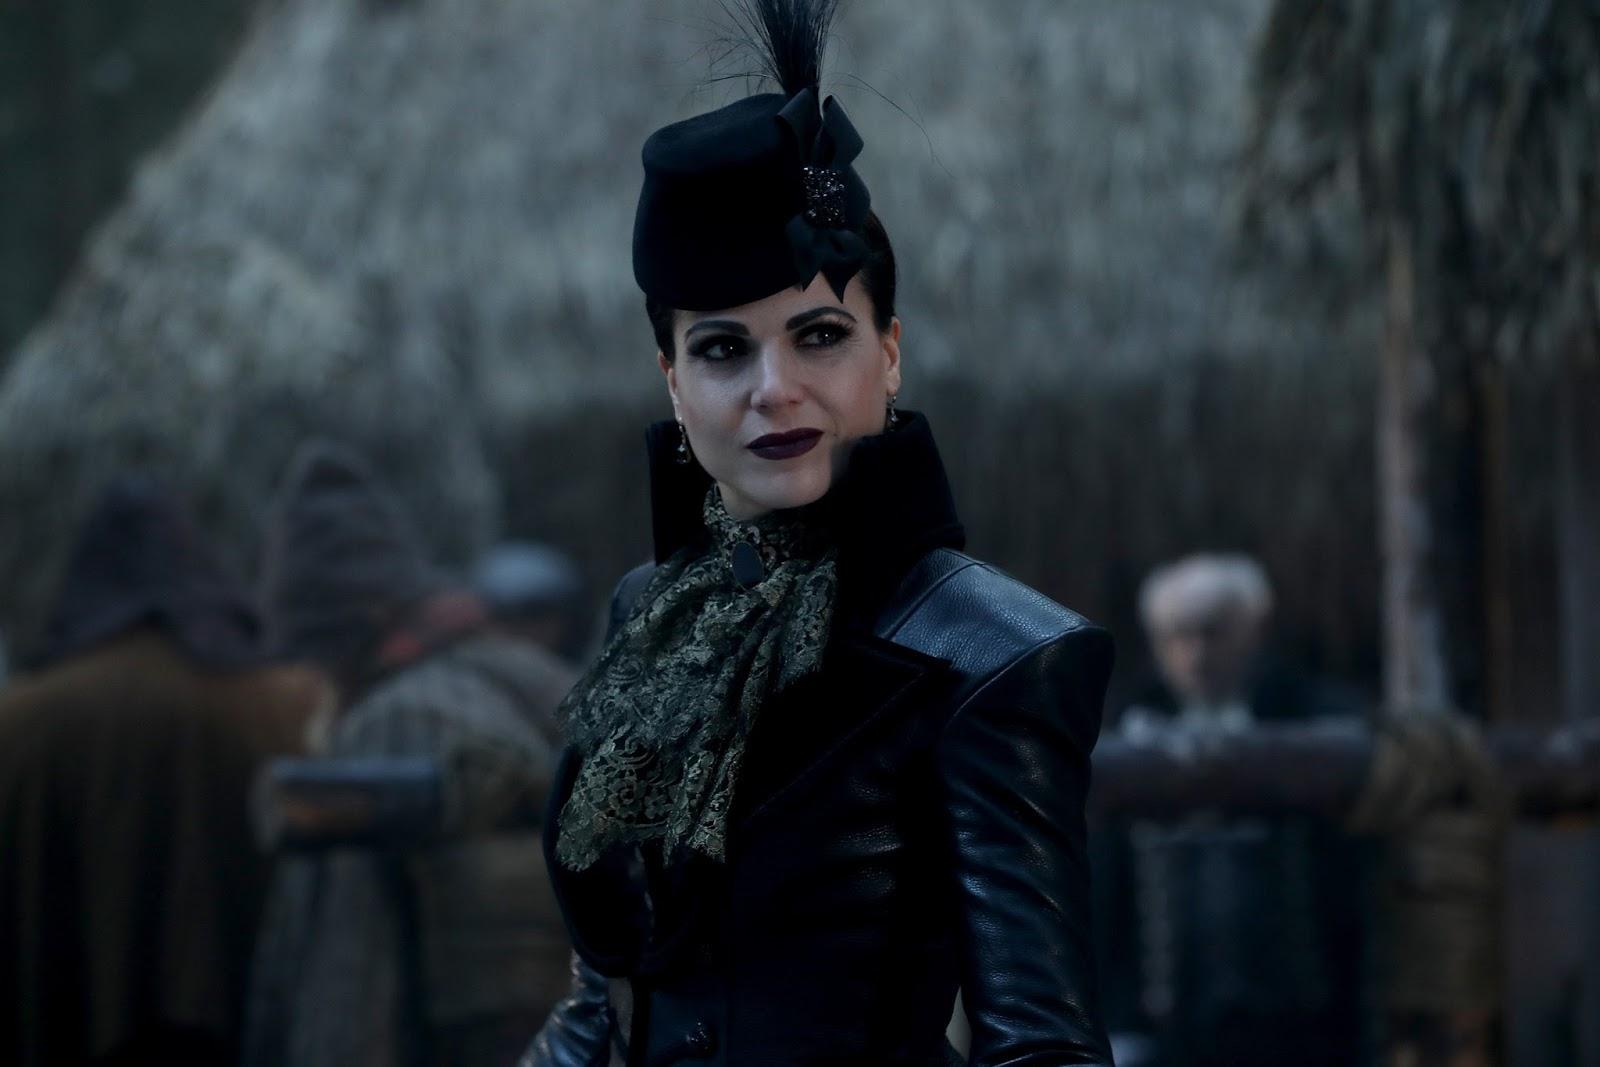 La Reina Malvada busca a Blancanieves en un flashback en Once Upon a Time